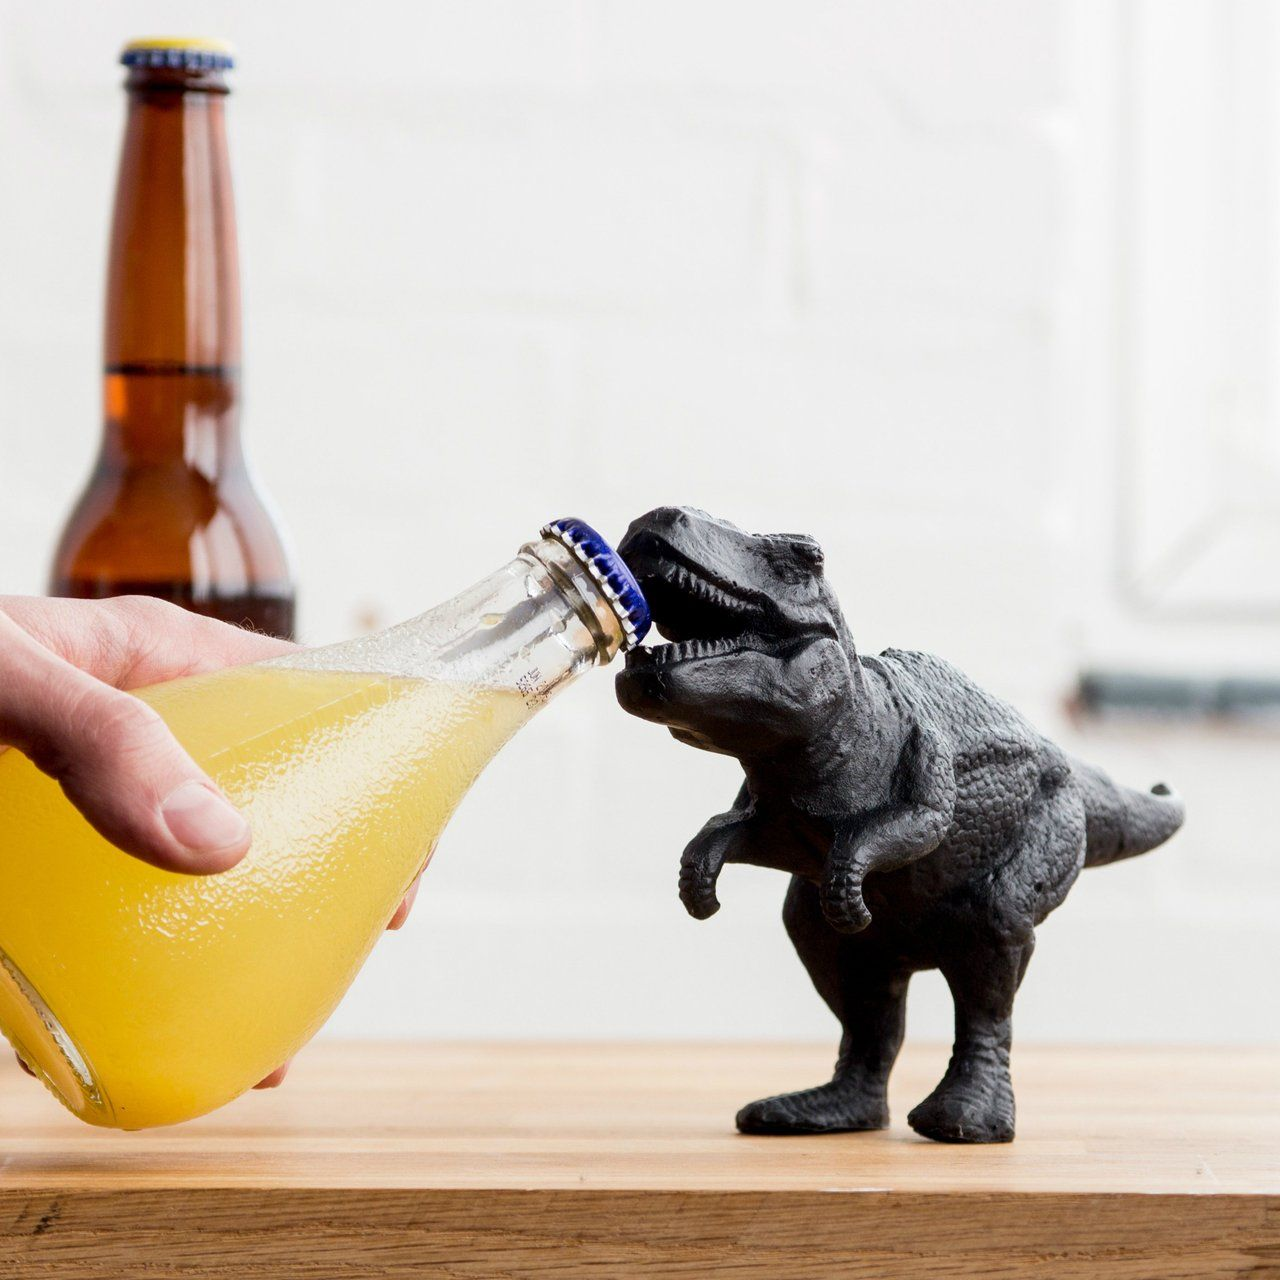 T Rex Bottle Opener Bottleopener Cool Dinosaur Cool Kitchen Gadgets Cool Stuff Cool Gadgets